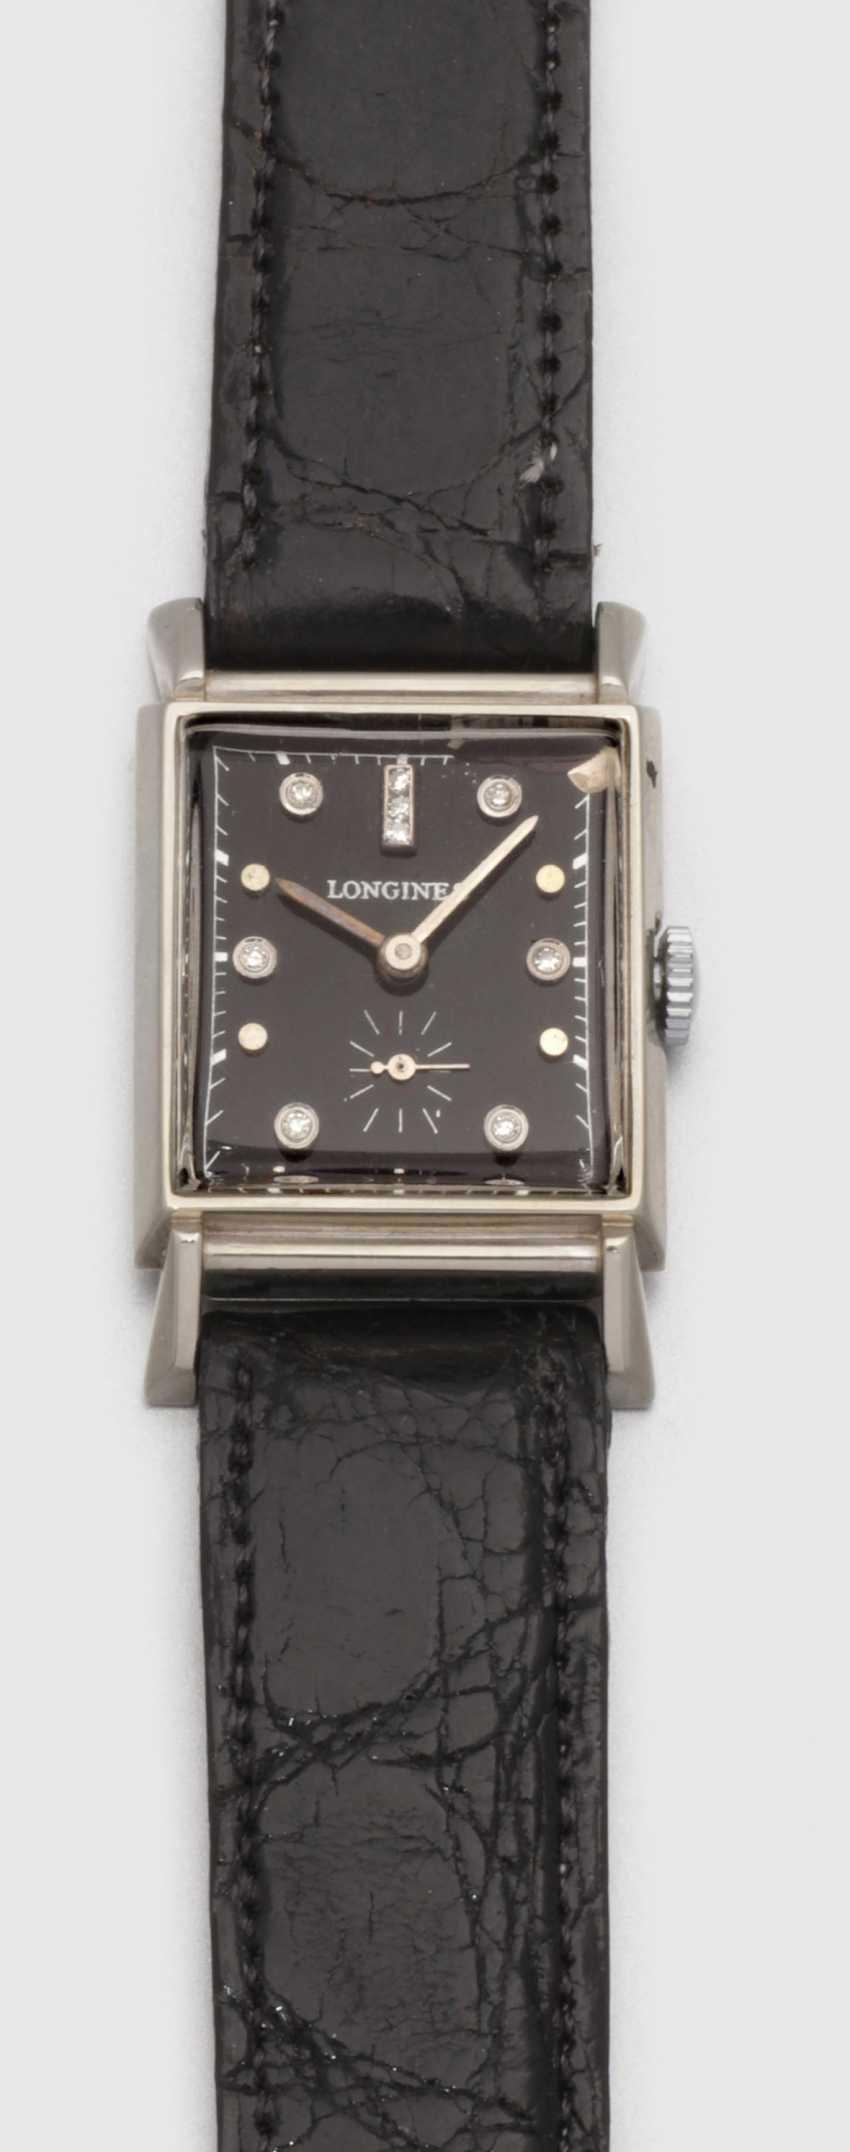 Наручные часы Longines с конца 40-х годов - фото 1